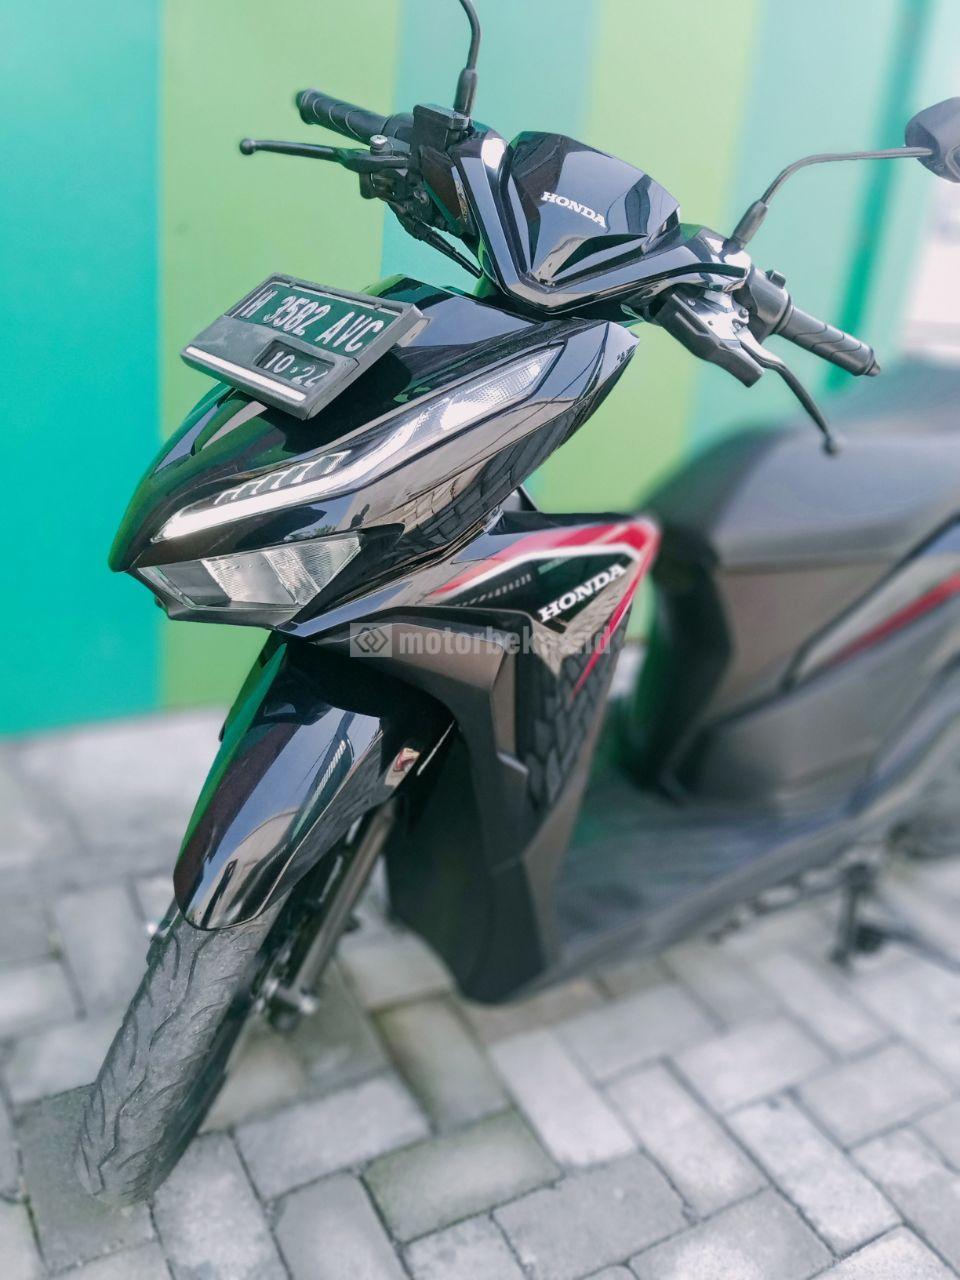 HONDA VARIO 125 FI 985 motorbekas.id